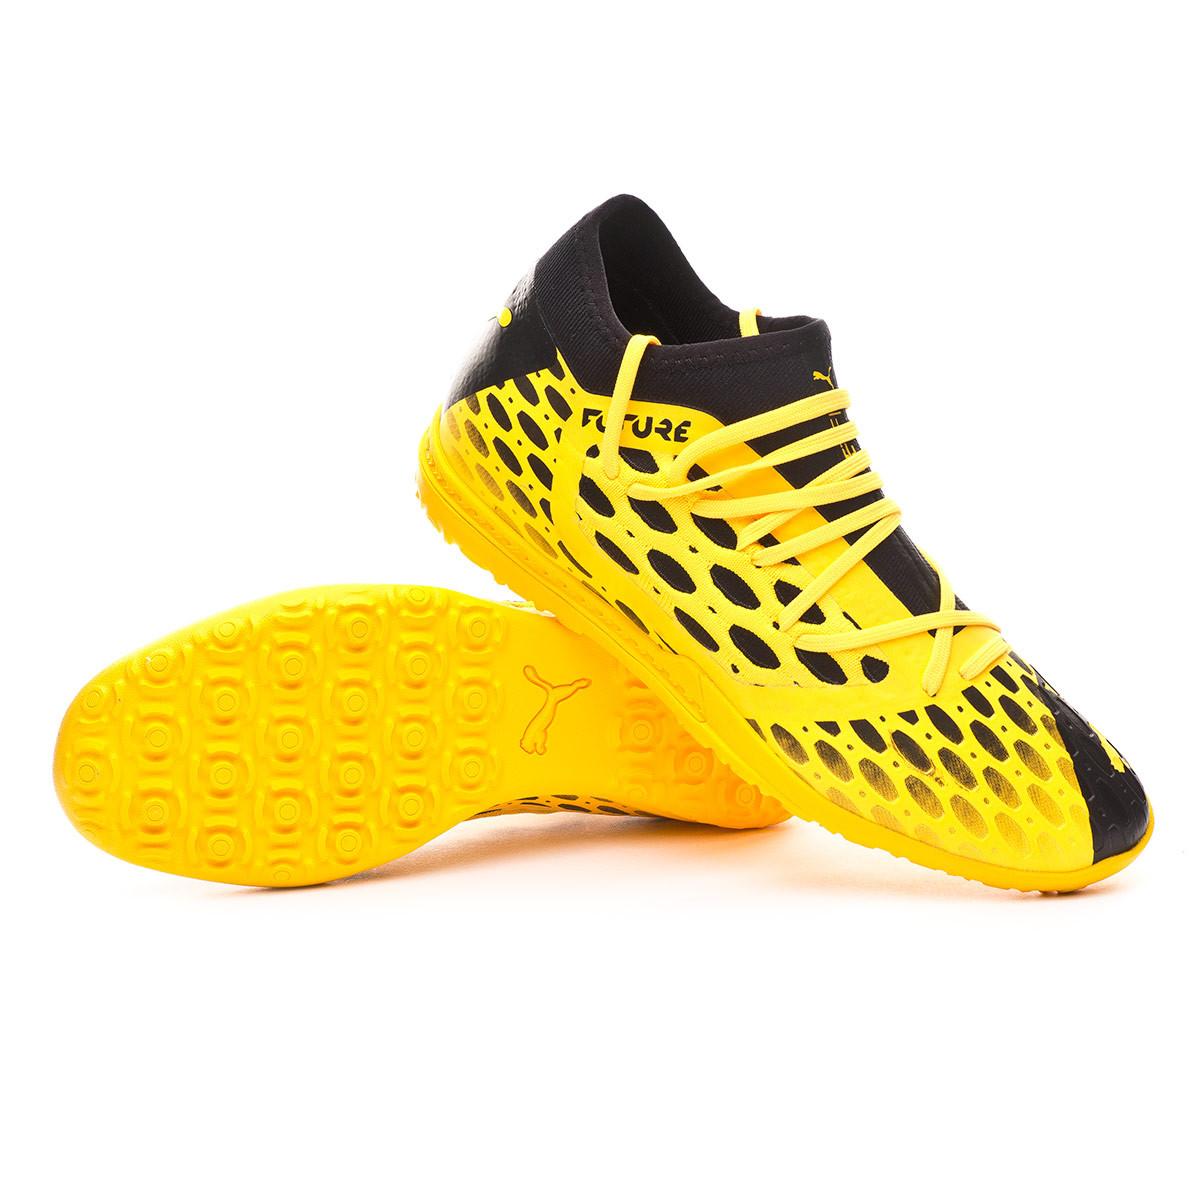 Puma Future 5.3 NETFIT Turf Football Boot